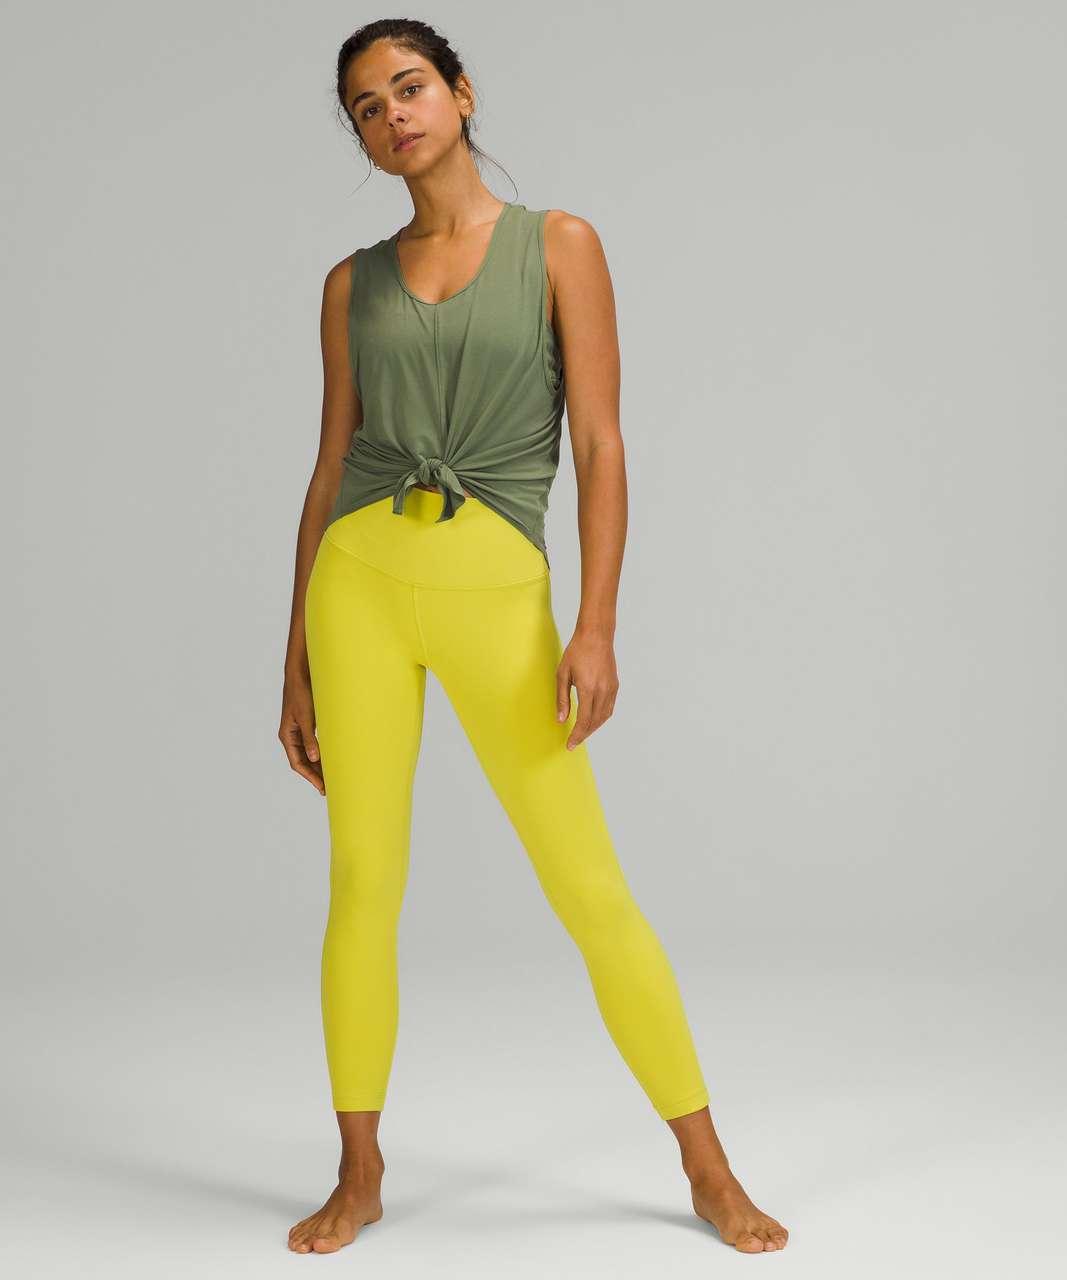 "Lululemon Align High-Rise Pant 25"" - Yellow Serpentine"